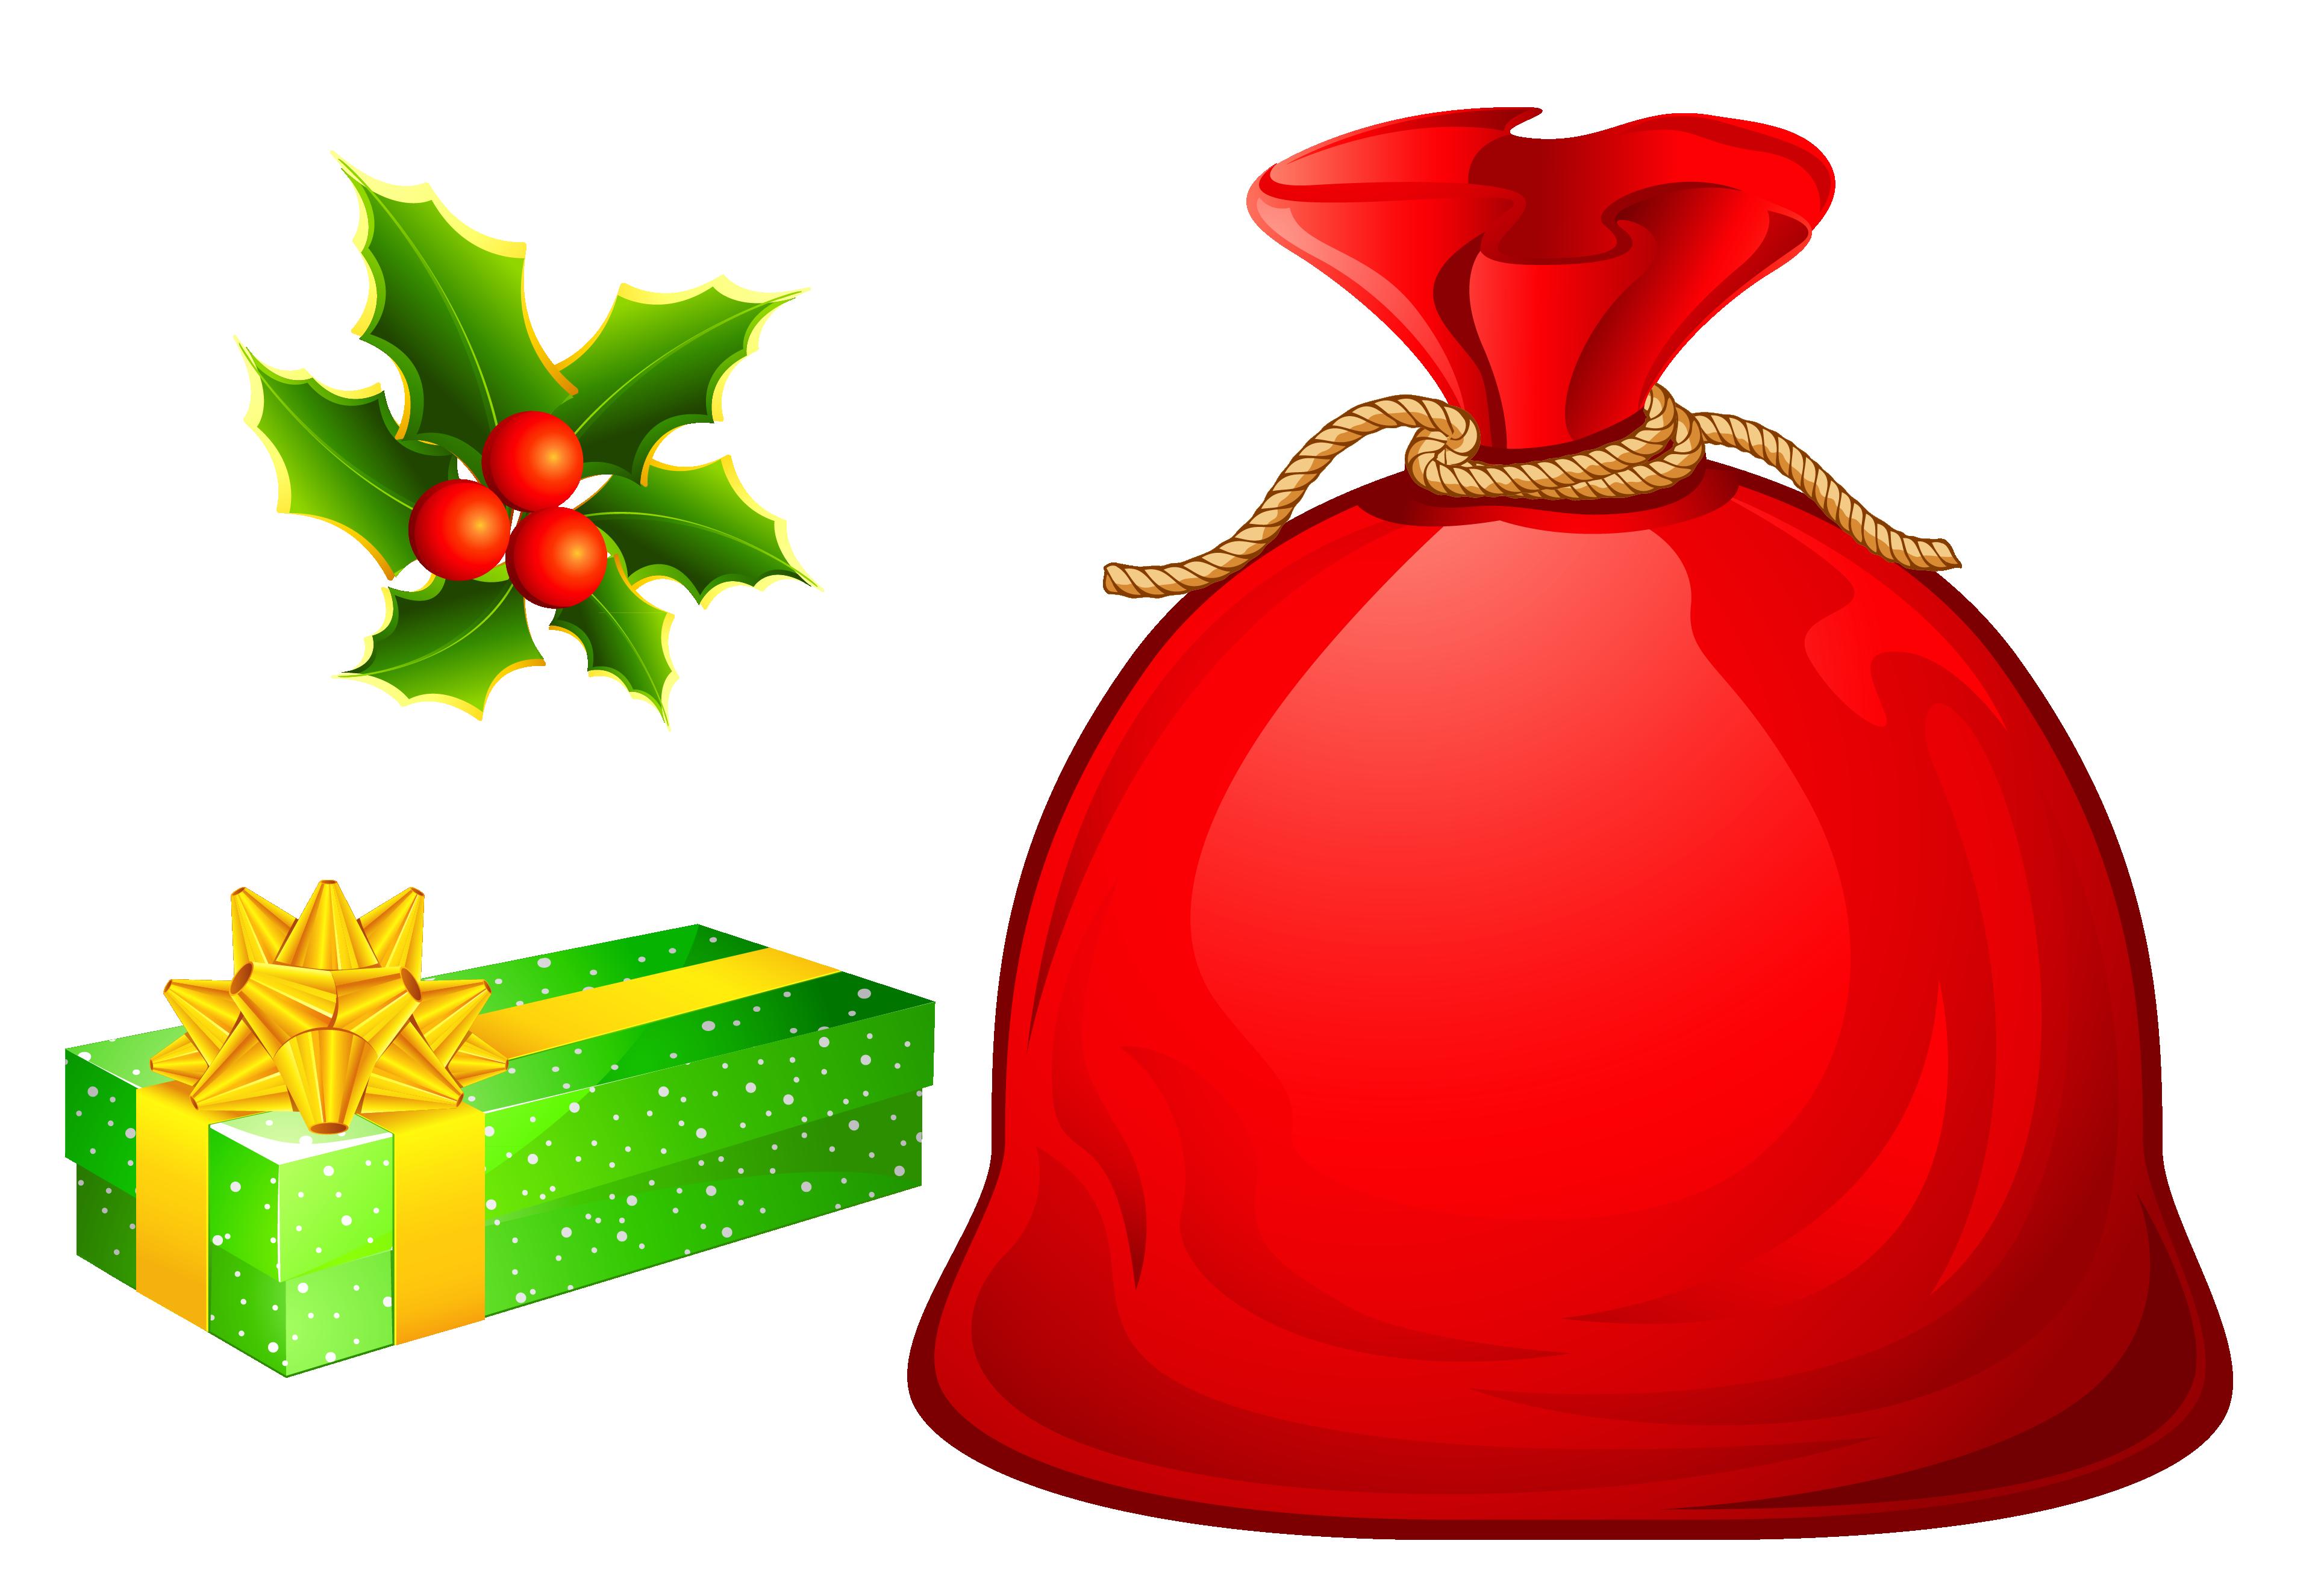 Coin clipart sack. Transparent santa bag and